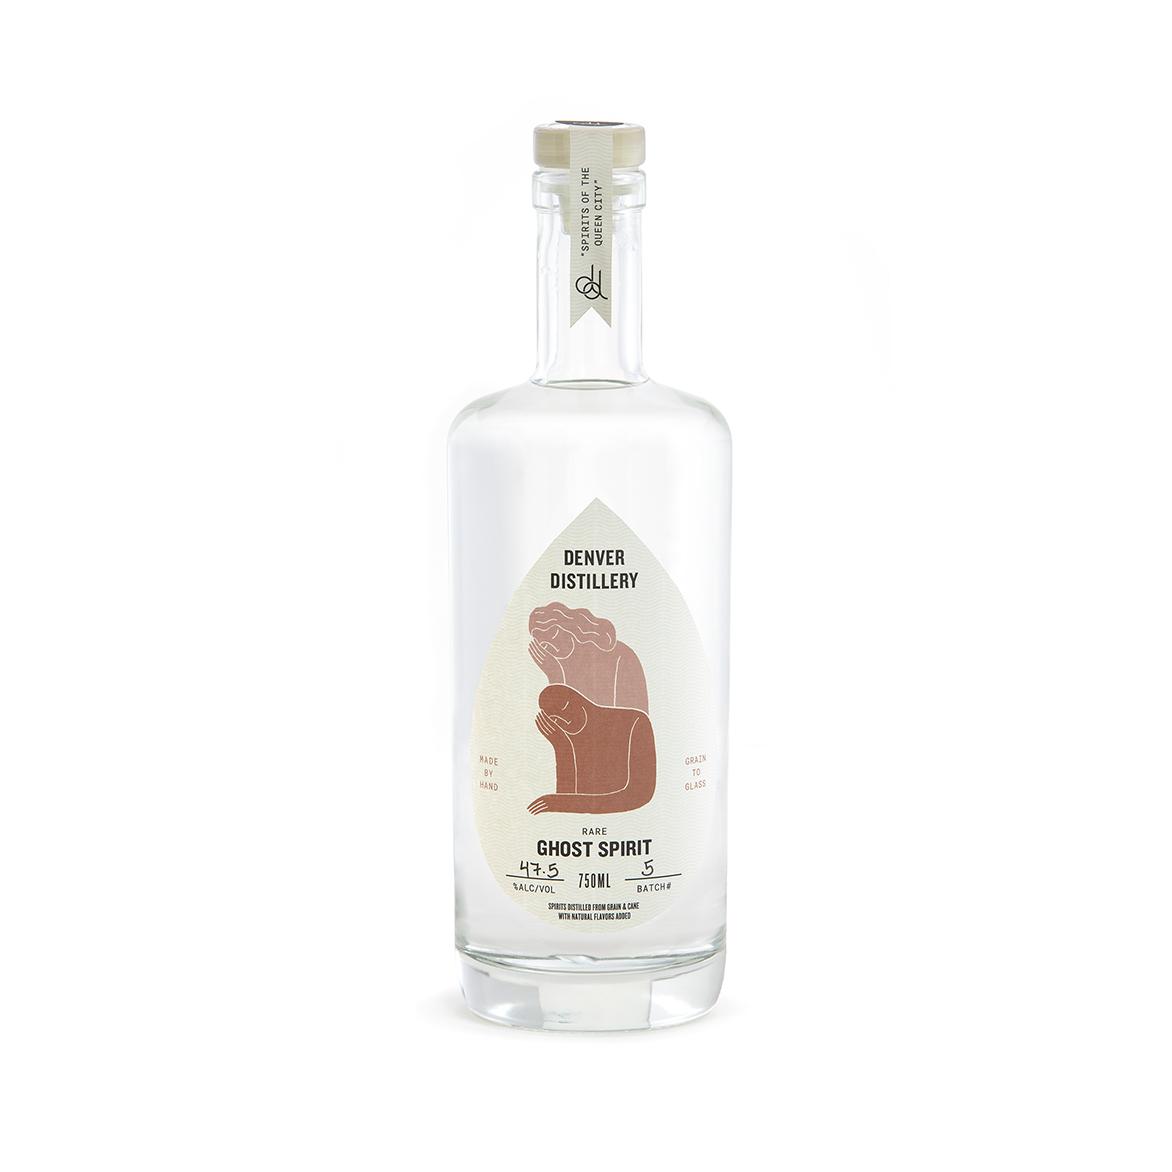 GHOST SPIRIT - – traditional mountain recipe– made from four grains & molasses– distilled through fresh lemon-lime citrus